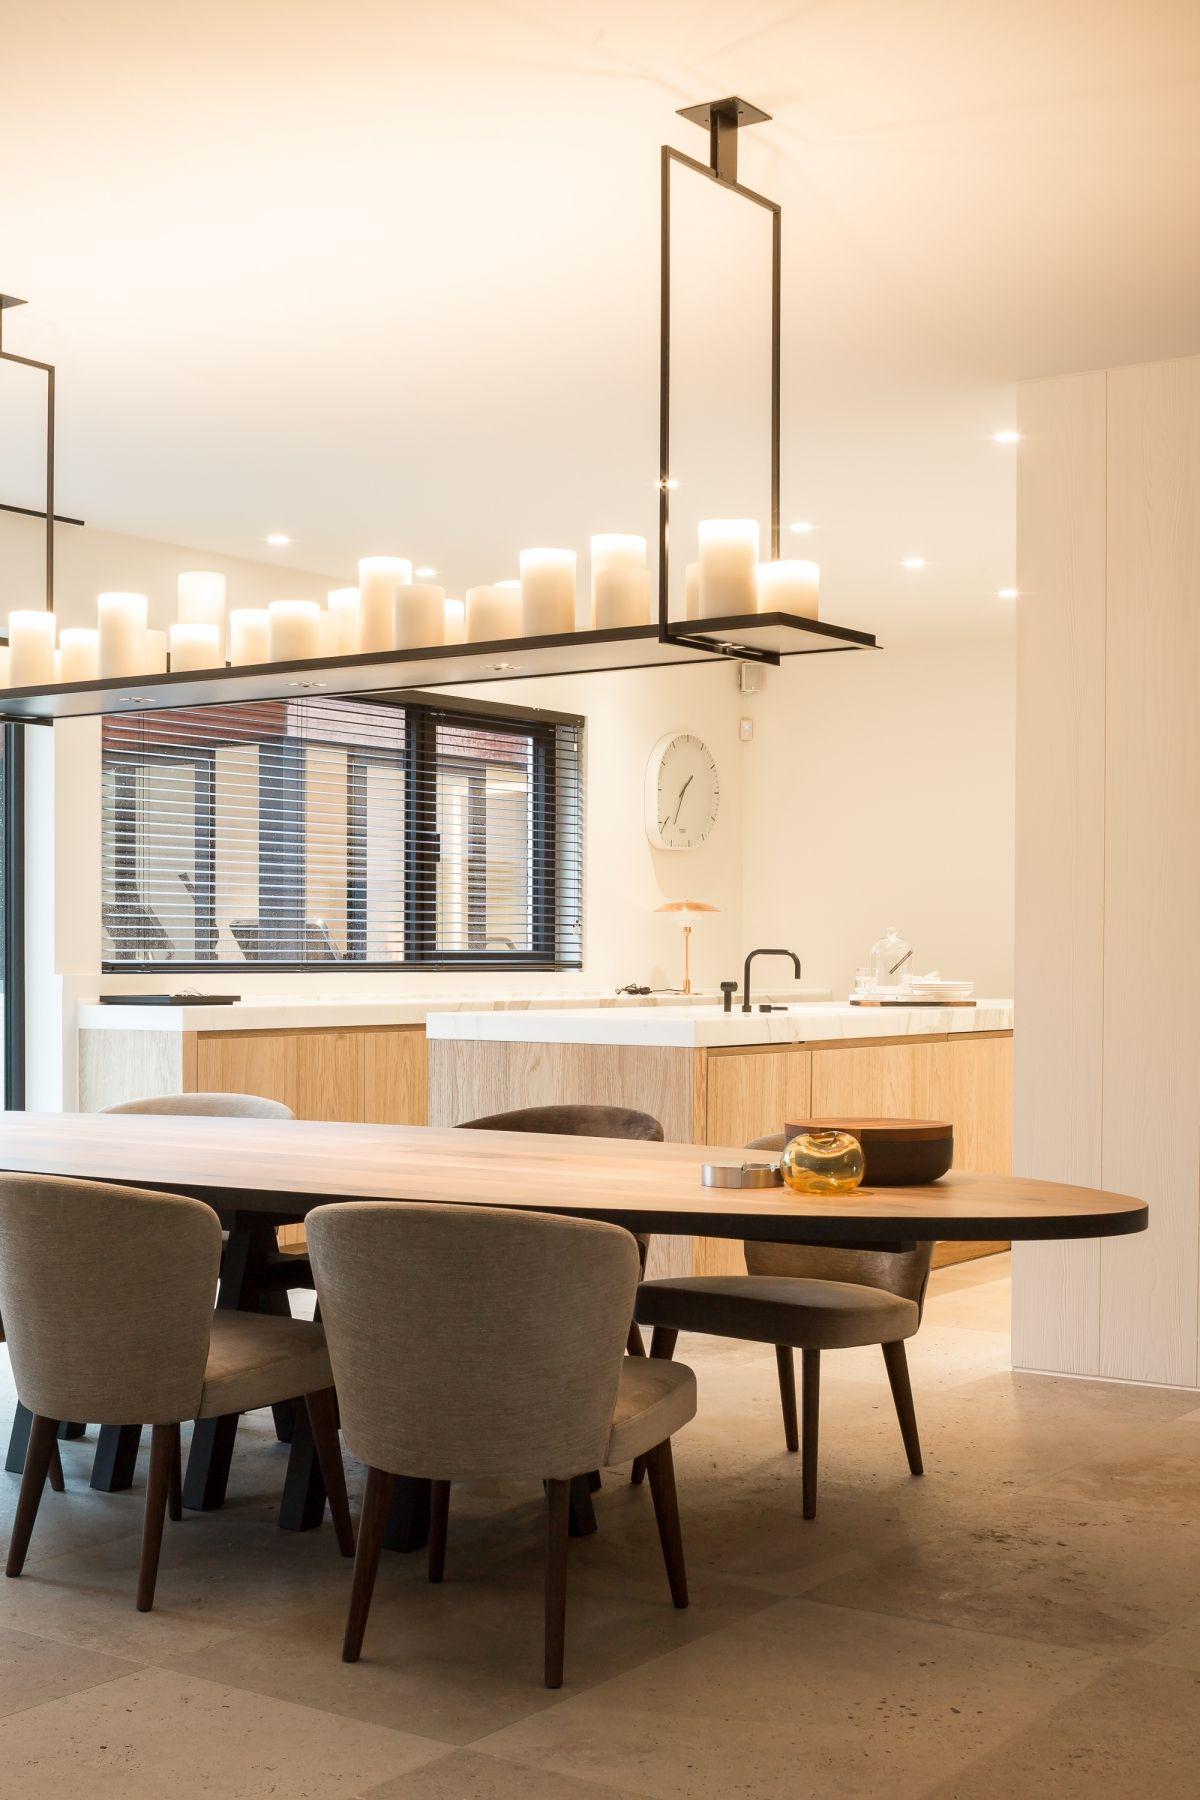 Knokke - Detail - RR Interieur | RR projects | Pinterest | House ...